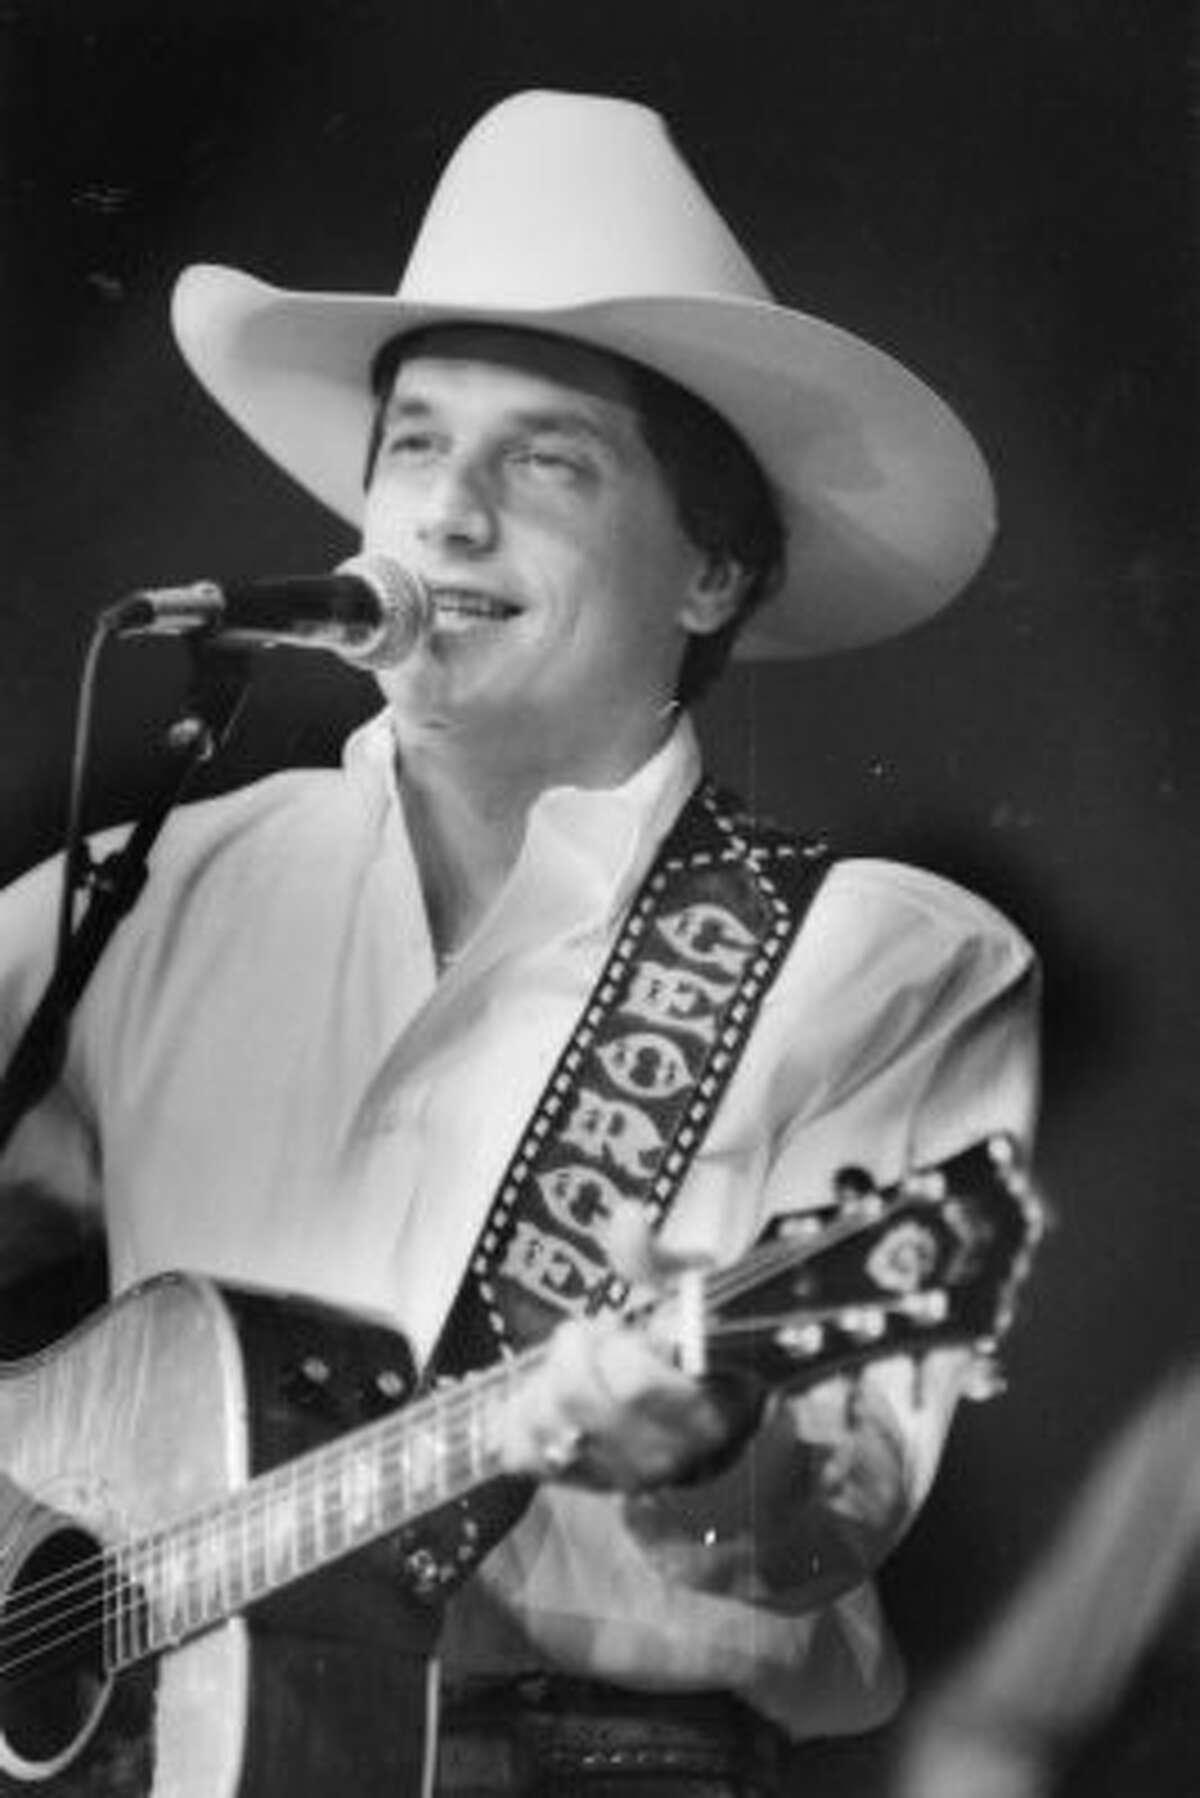 George Strait at the 1987 Houston Livestock Show.